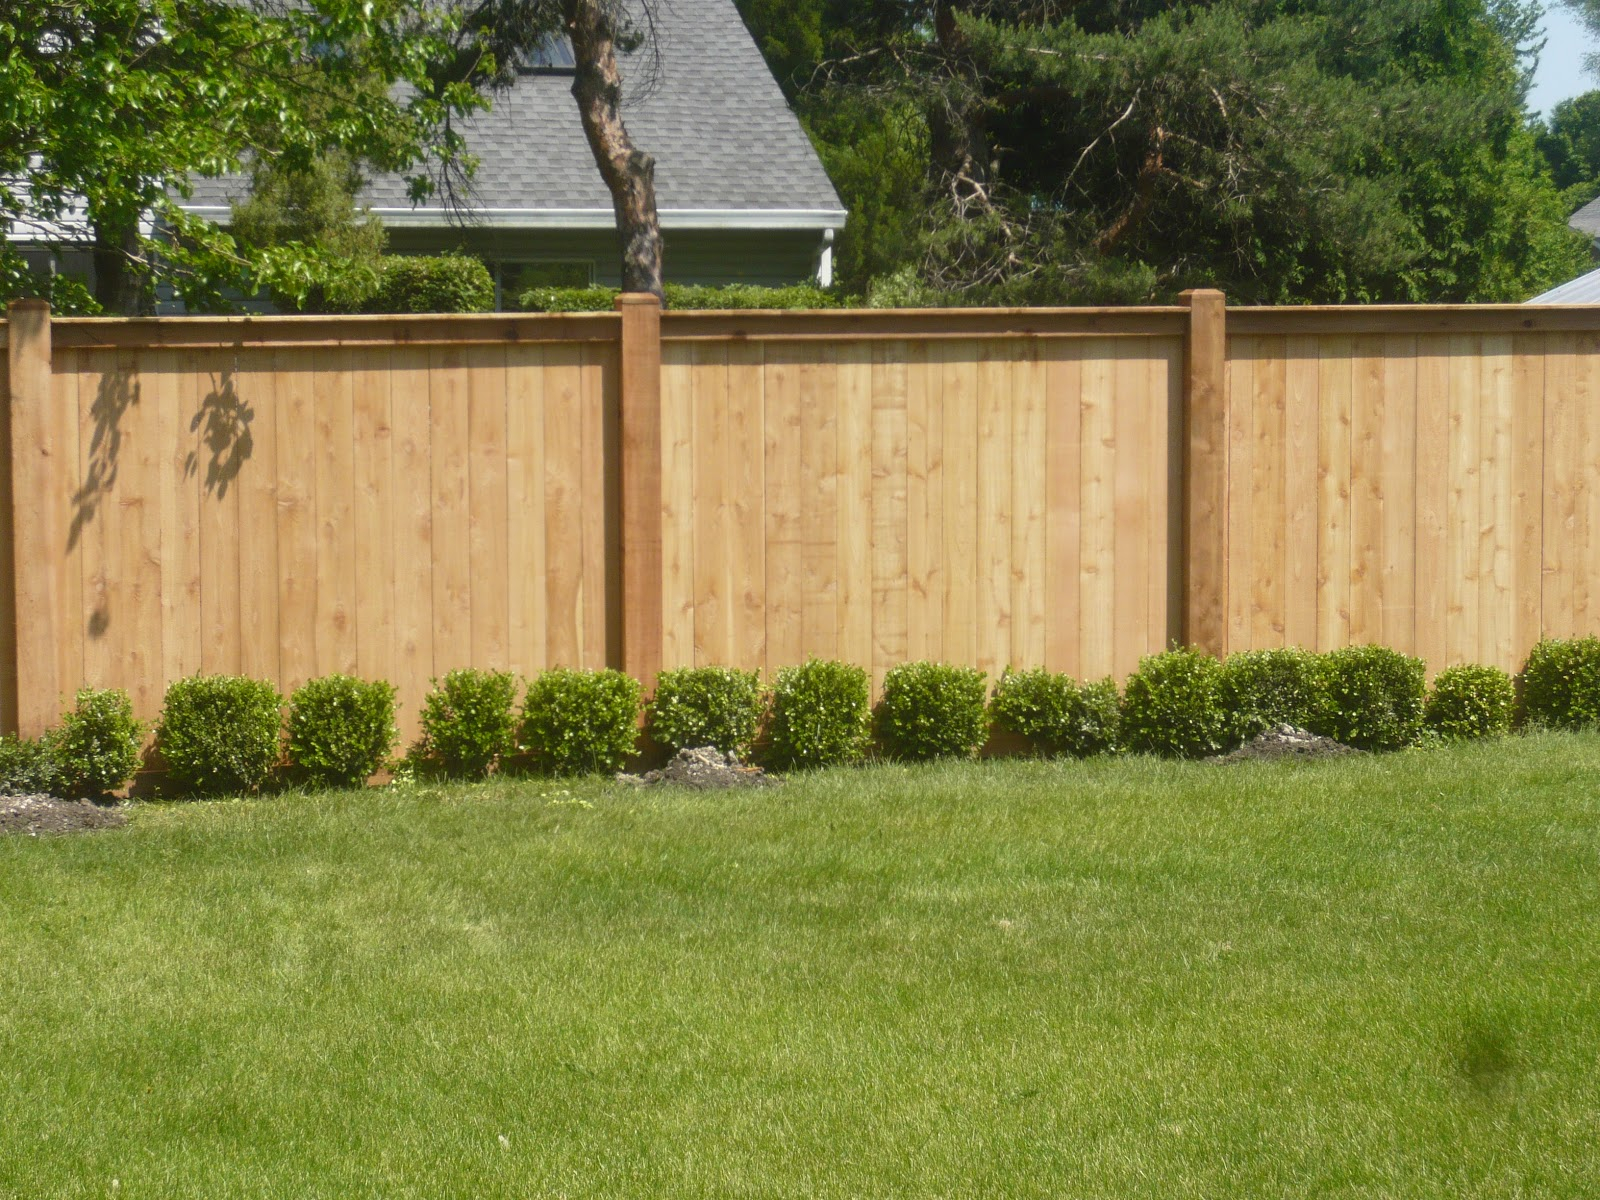 14.SIMPHOME.COM simple backyard fence ideas fence and gate ideas